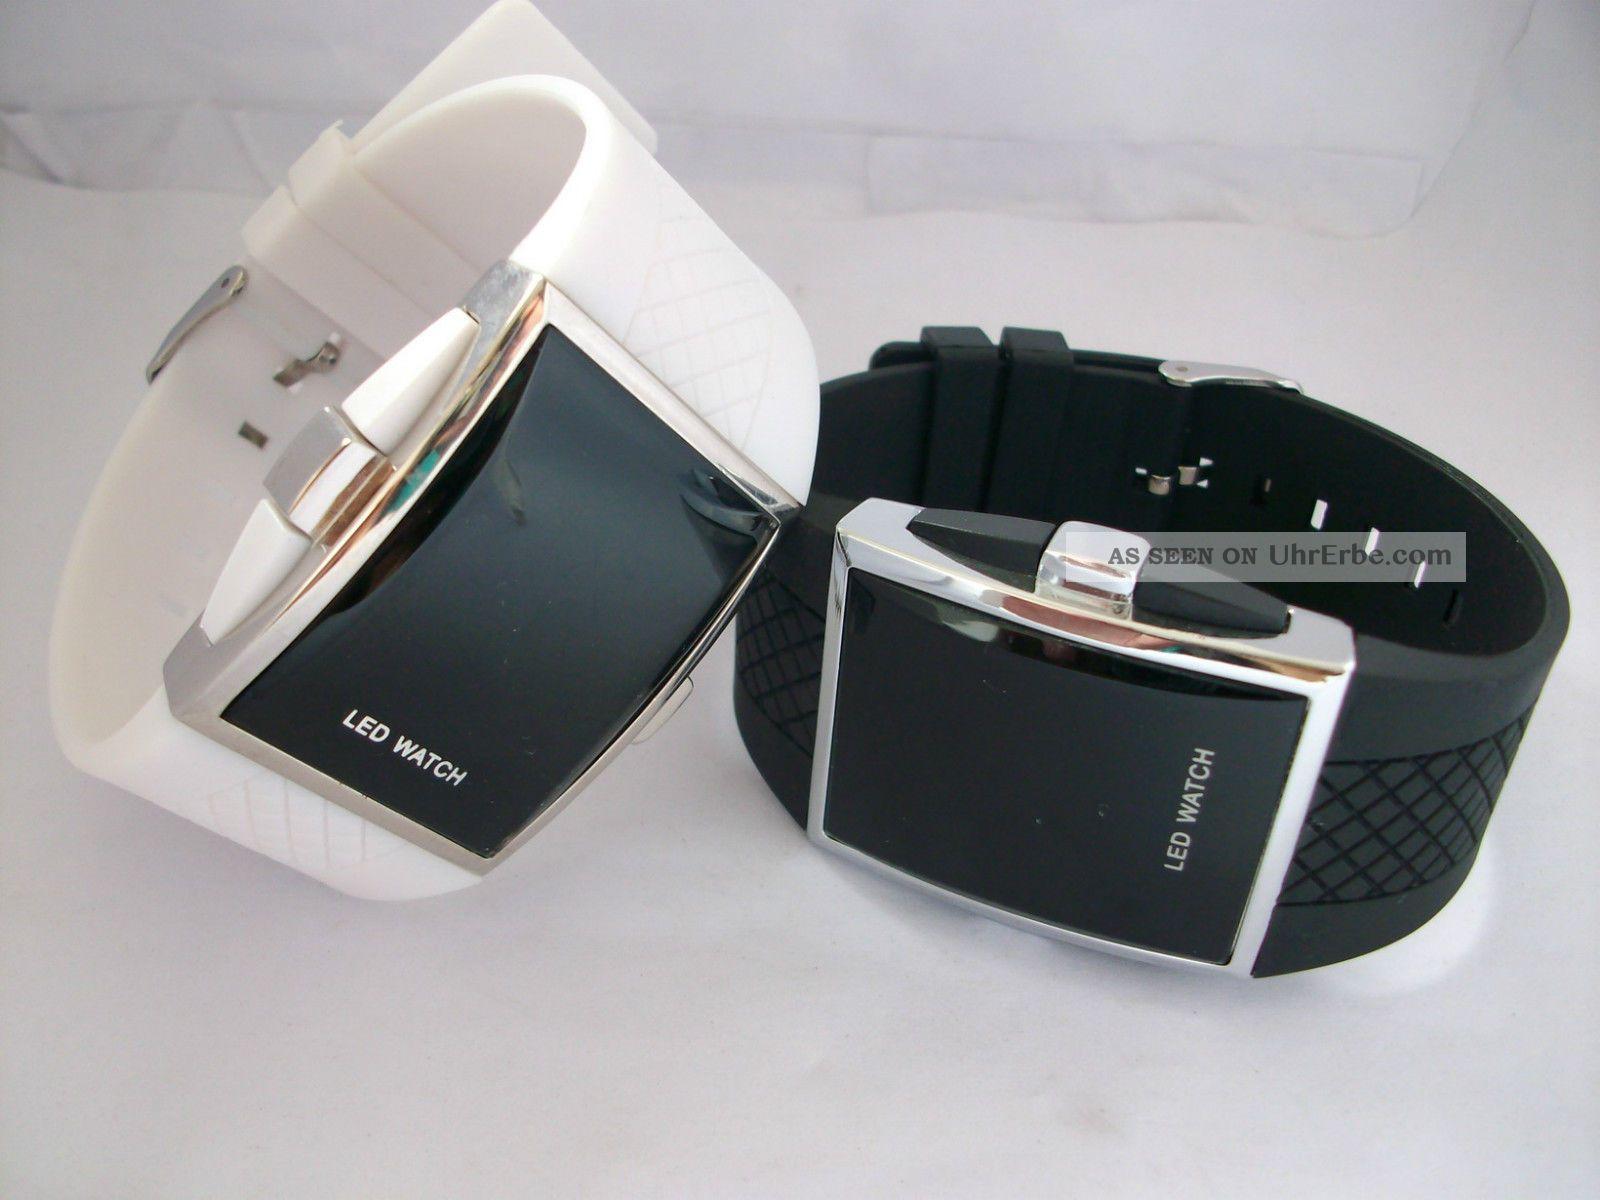 intercrew blackeagle armbanduhr mit roter led. Black Bedroom Furniture Sets. Home Design Ideas